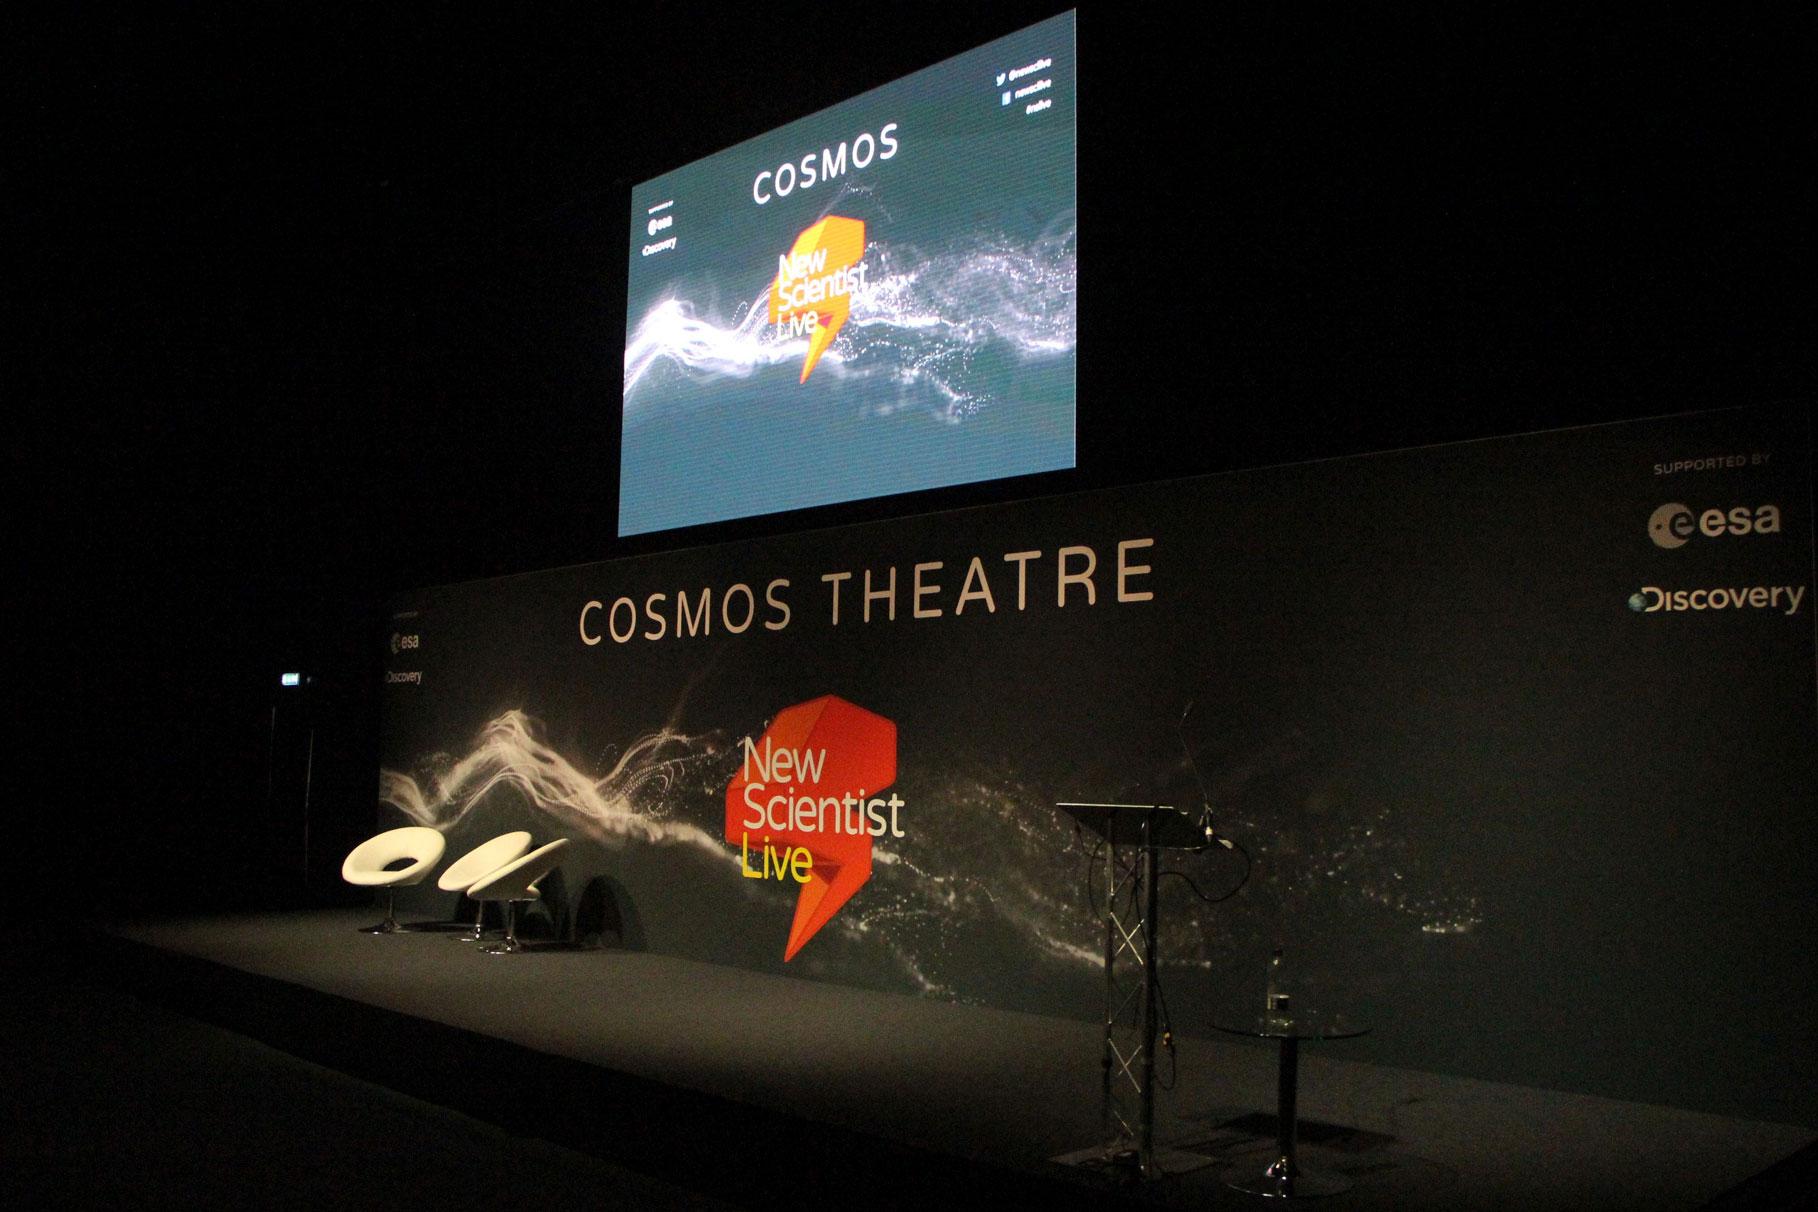 OneBigStar New Scientist Live Cosmos Theatre Exhibition Features & Theatres